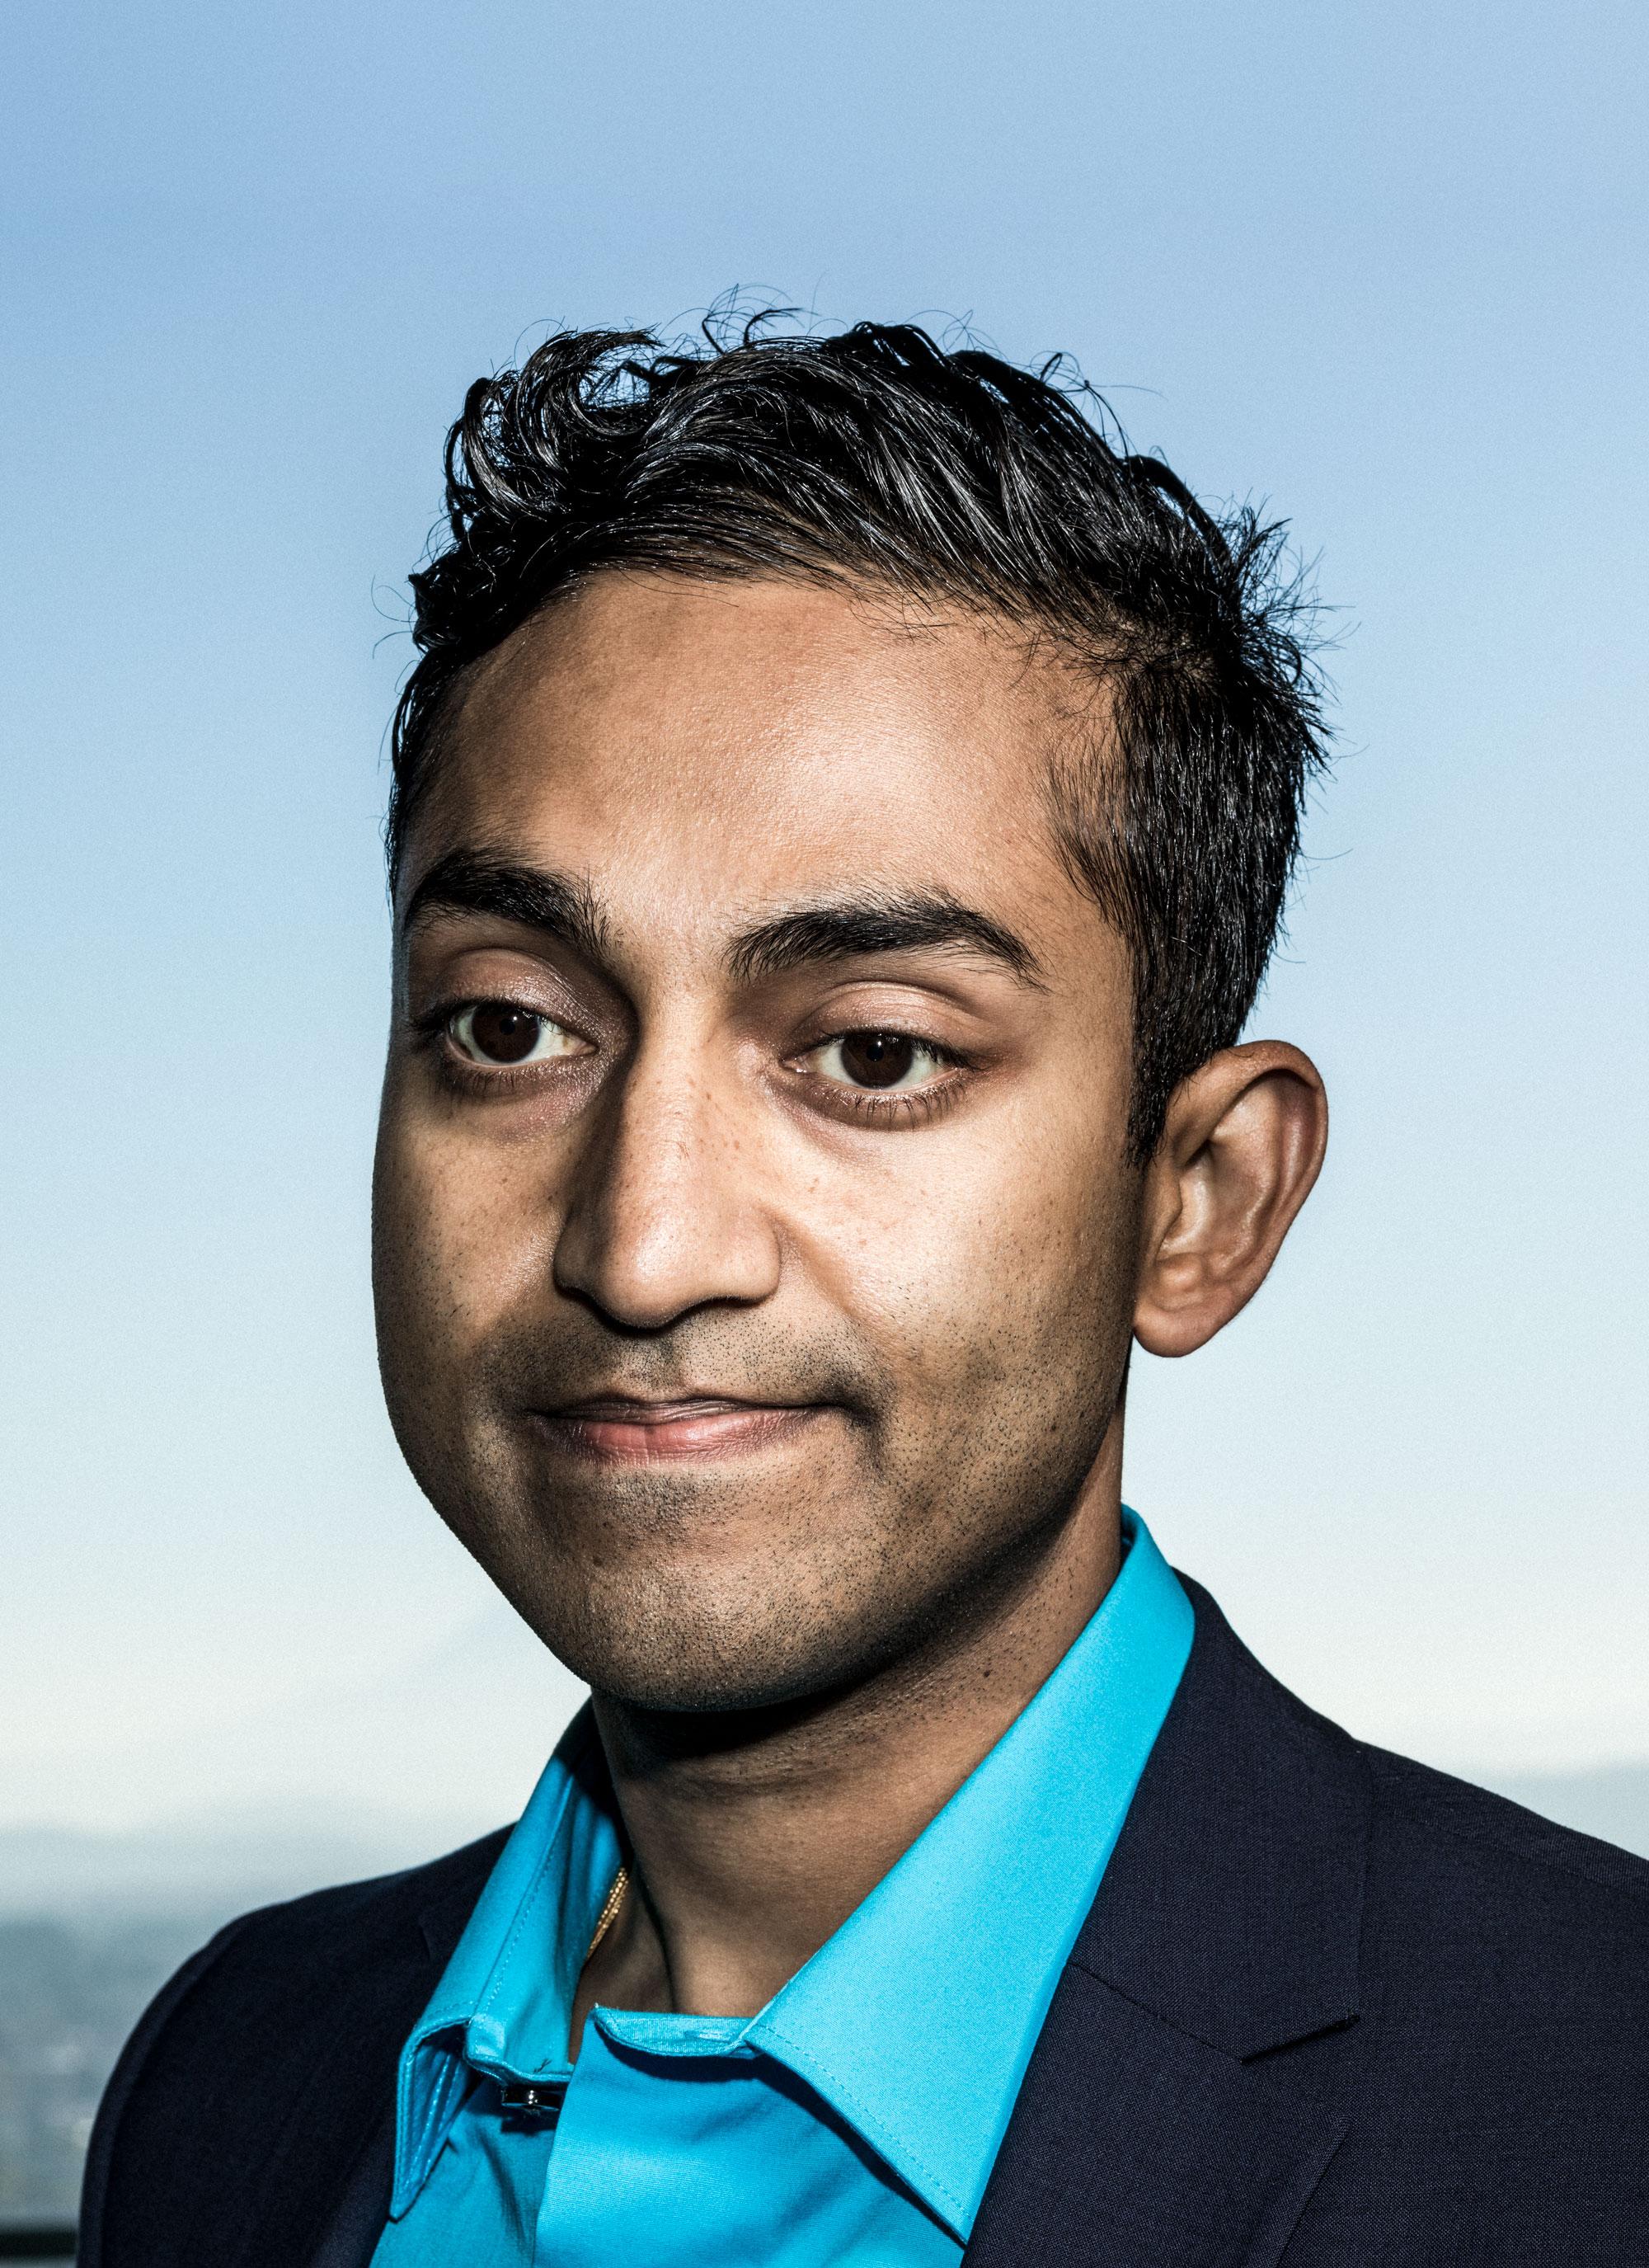 Portrait of Vinay Prasad